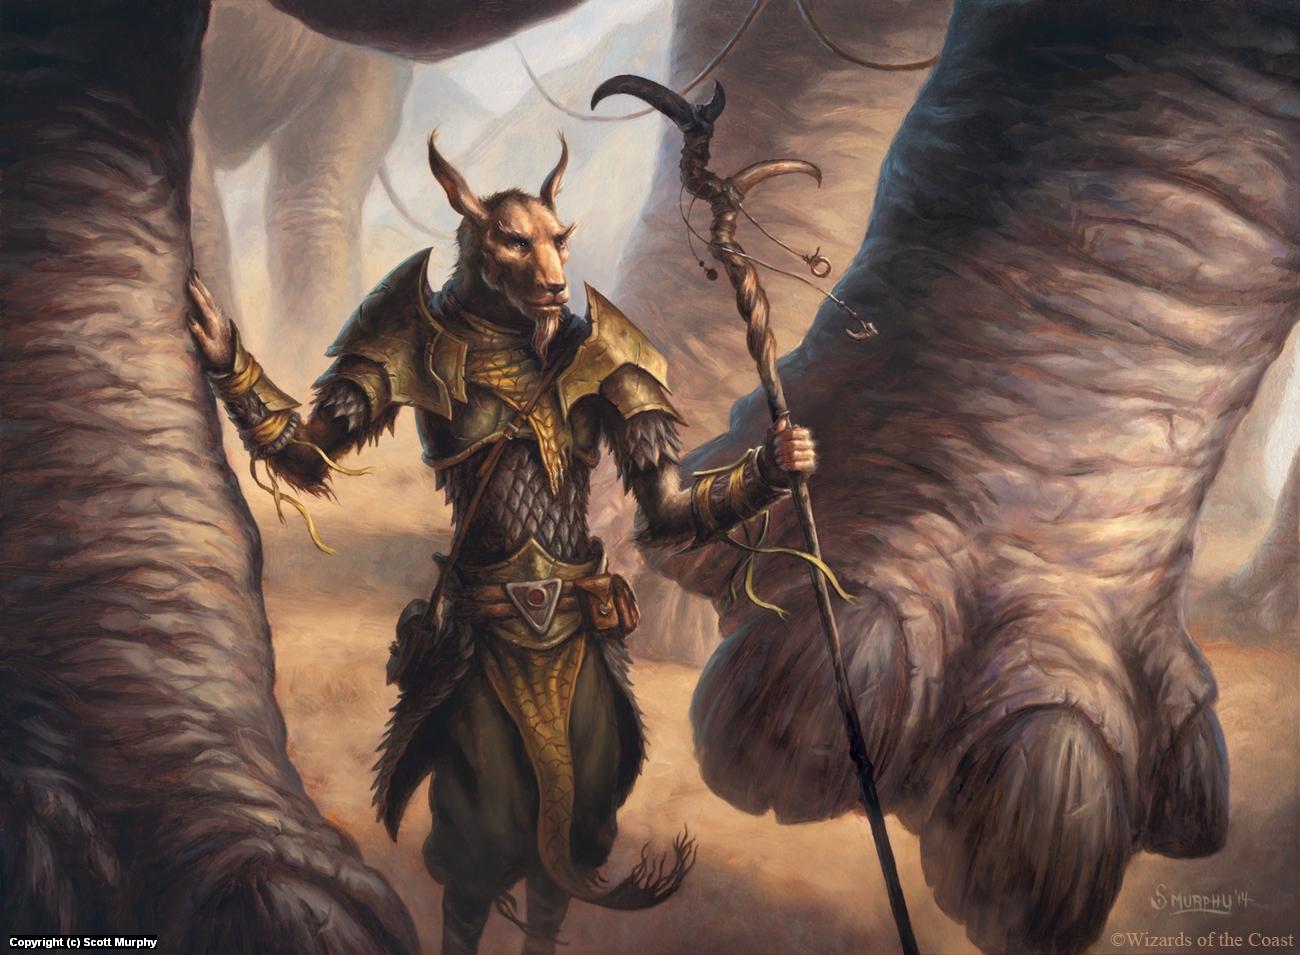 Abzan Beastmaster Artwork by Scott Murphy